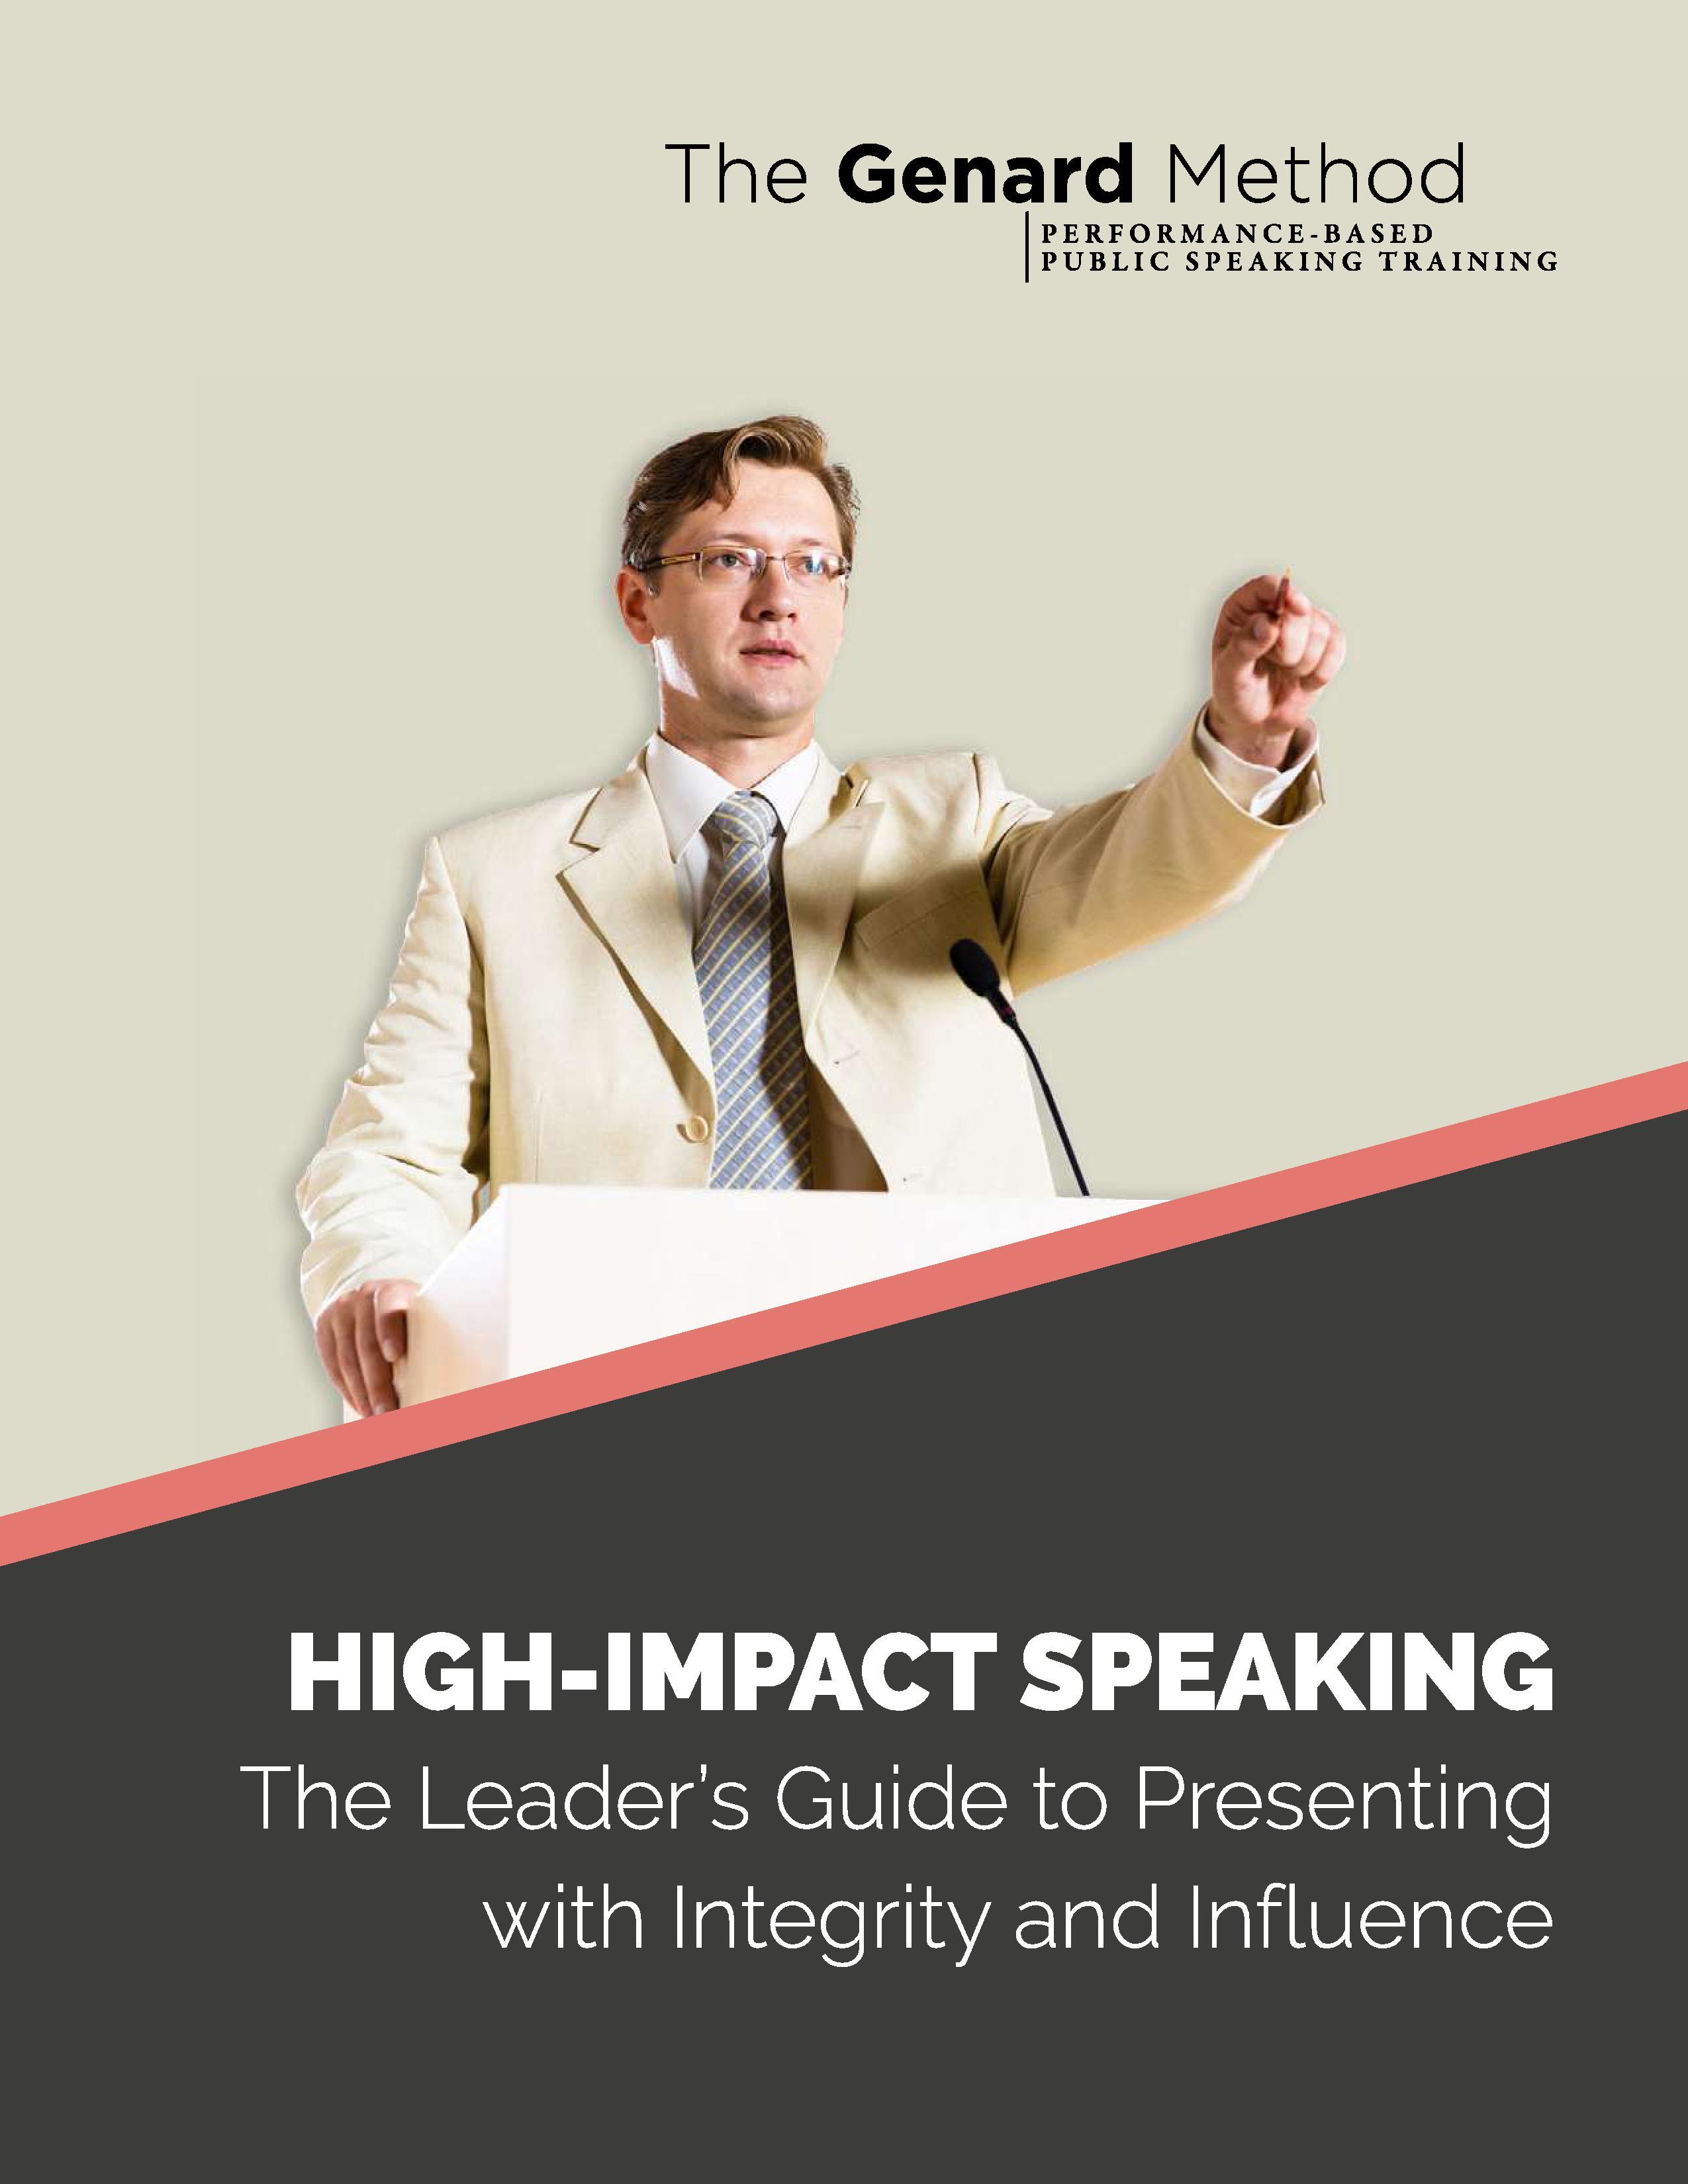 Guide for Leadership Speaking